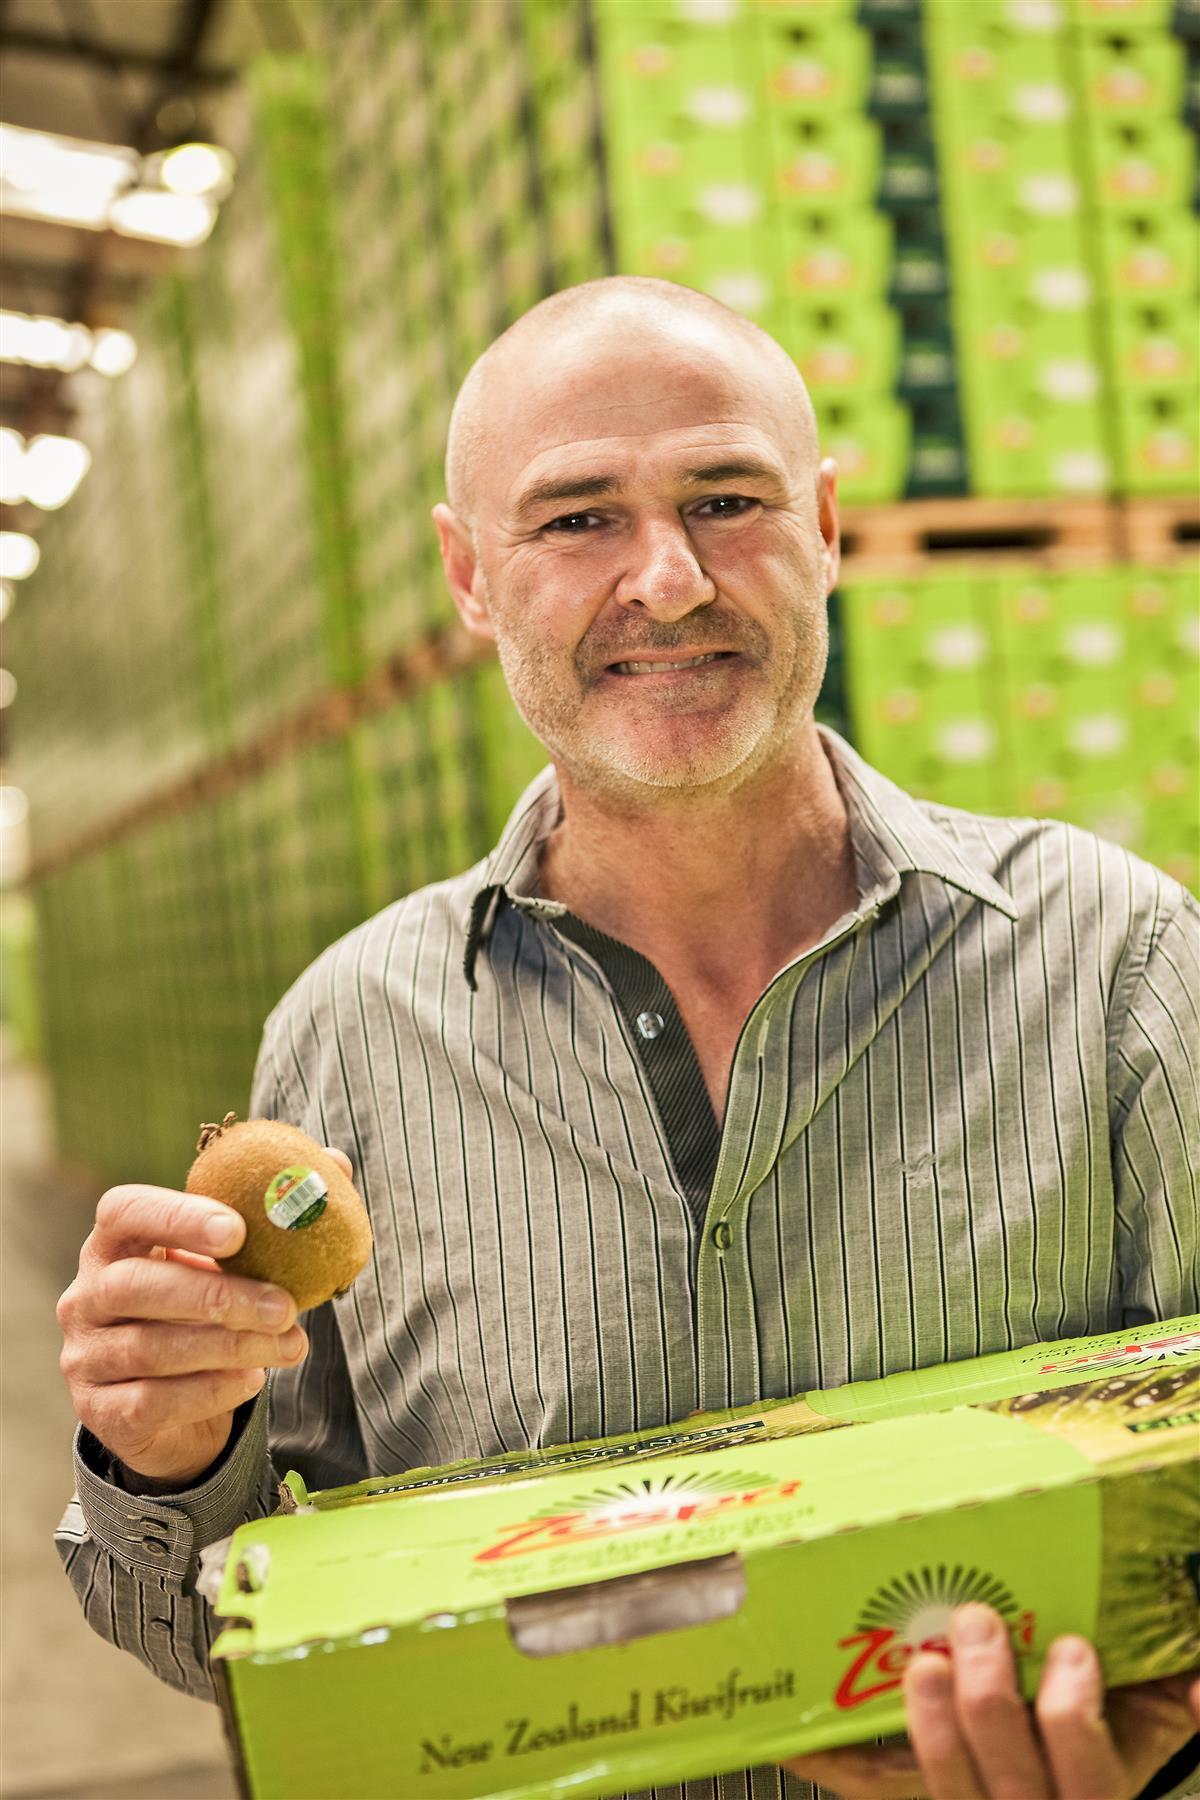 Image of Murray McBride